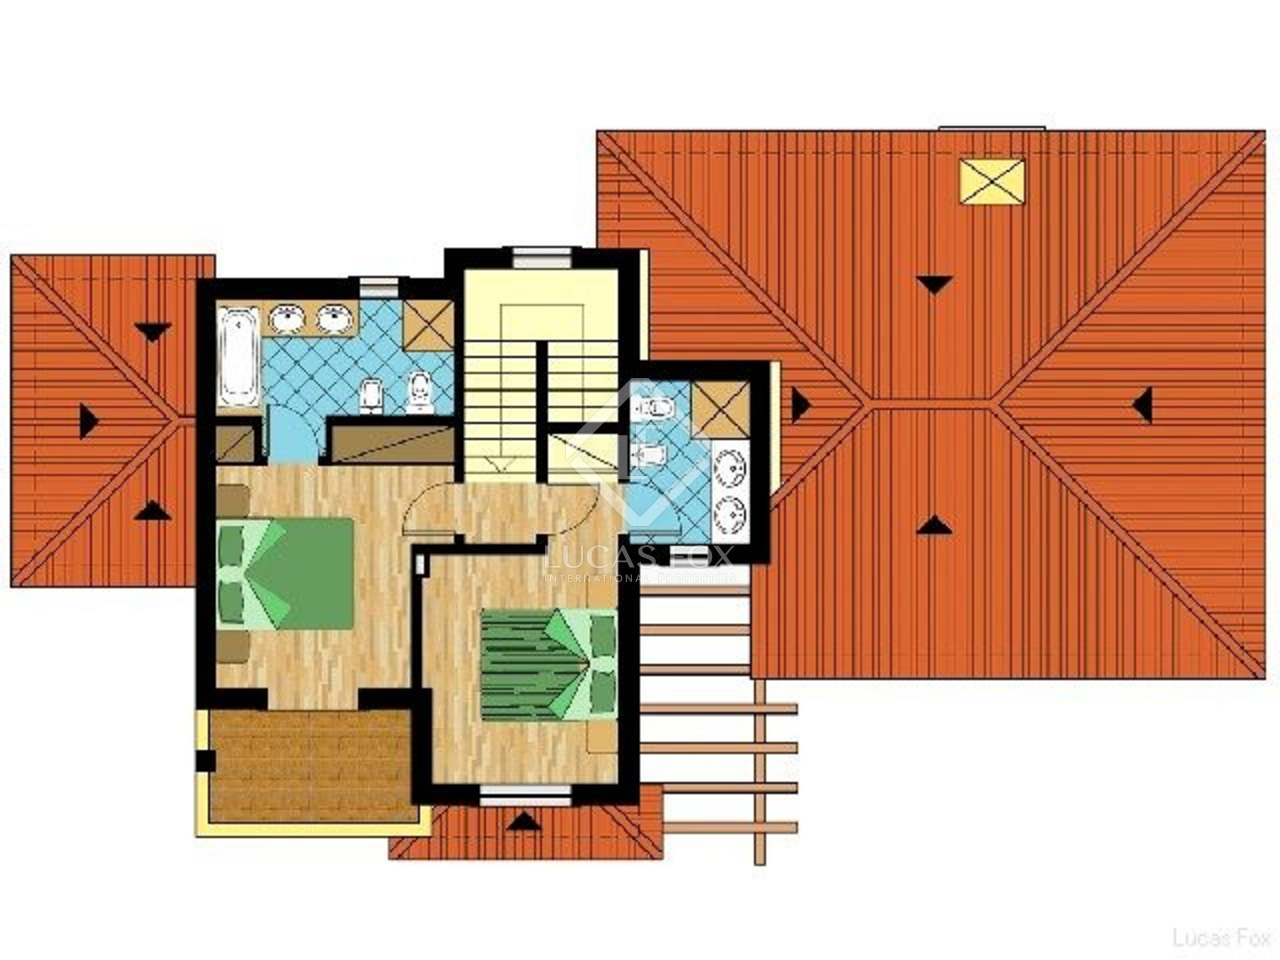 300m haus villa zum verkauf in algarve portugal. Black Bedroom Furniture Sets. Home Design Ideas